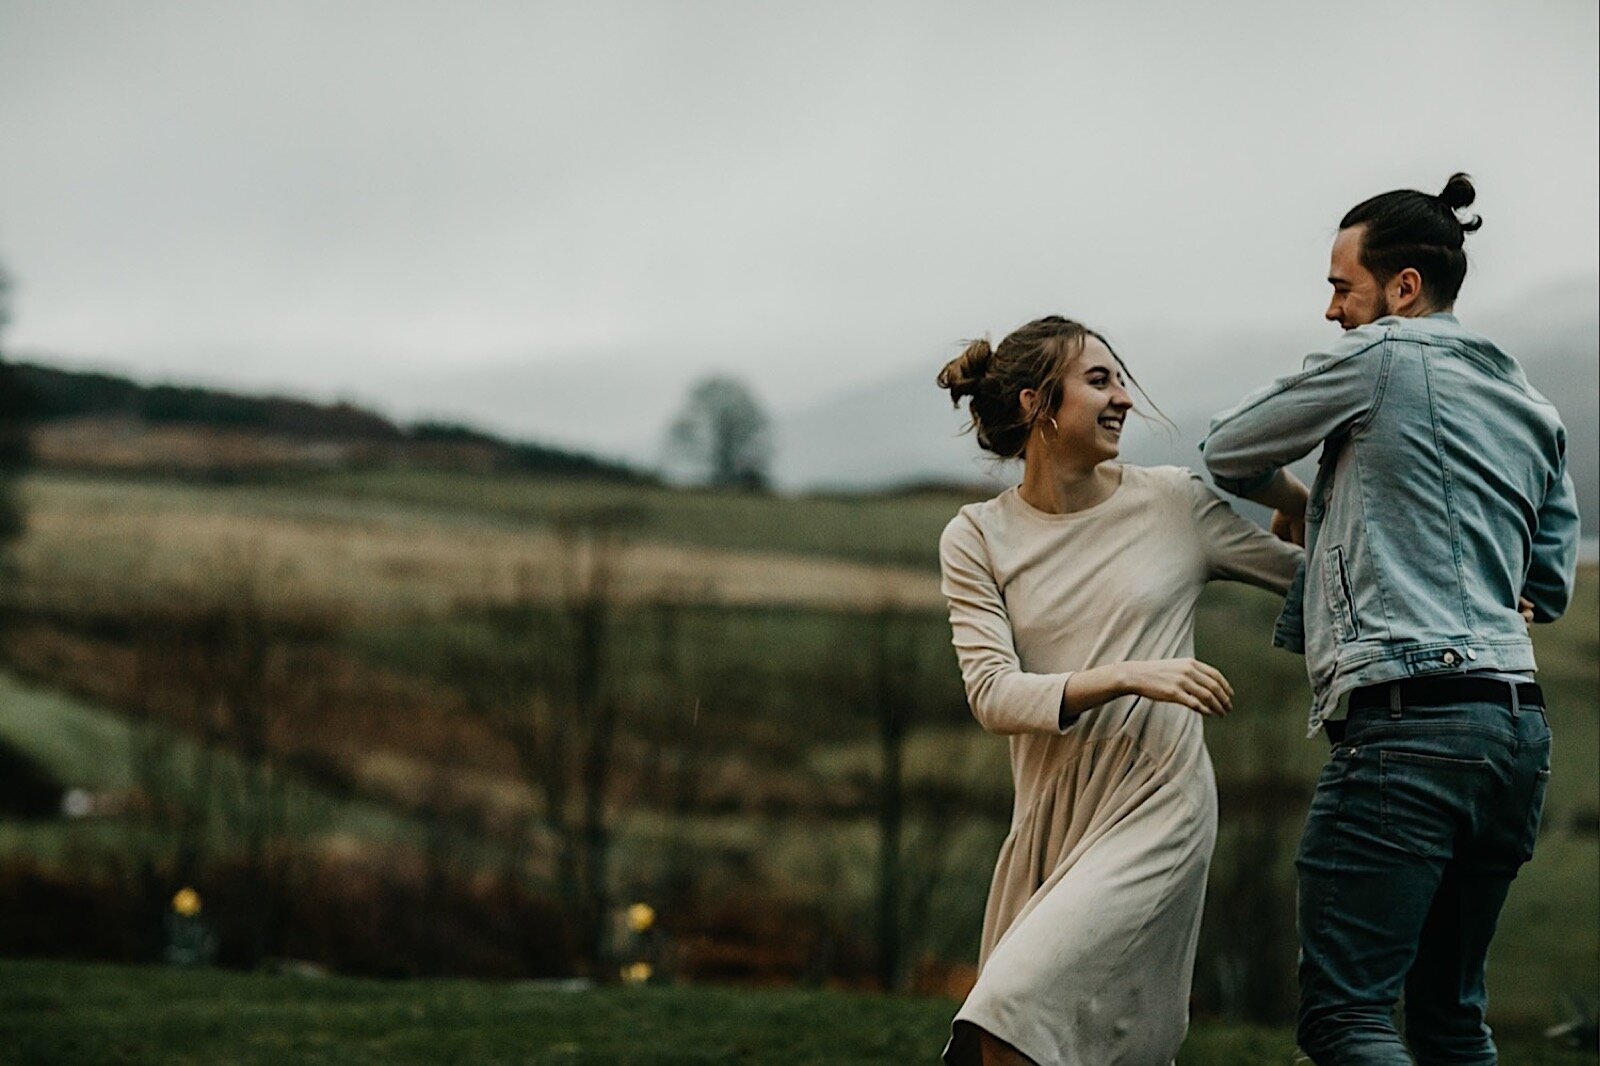 09_scotland_couple_shoot_lety_photography (12 von 36).jpg